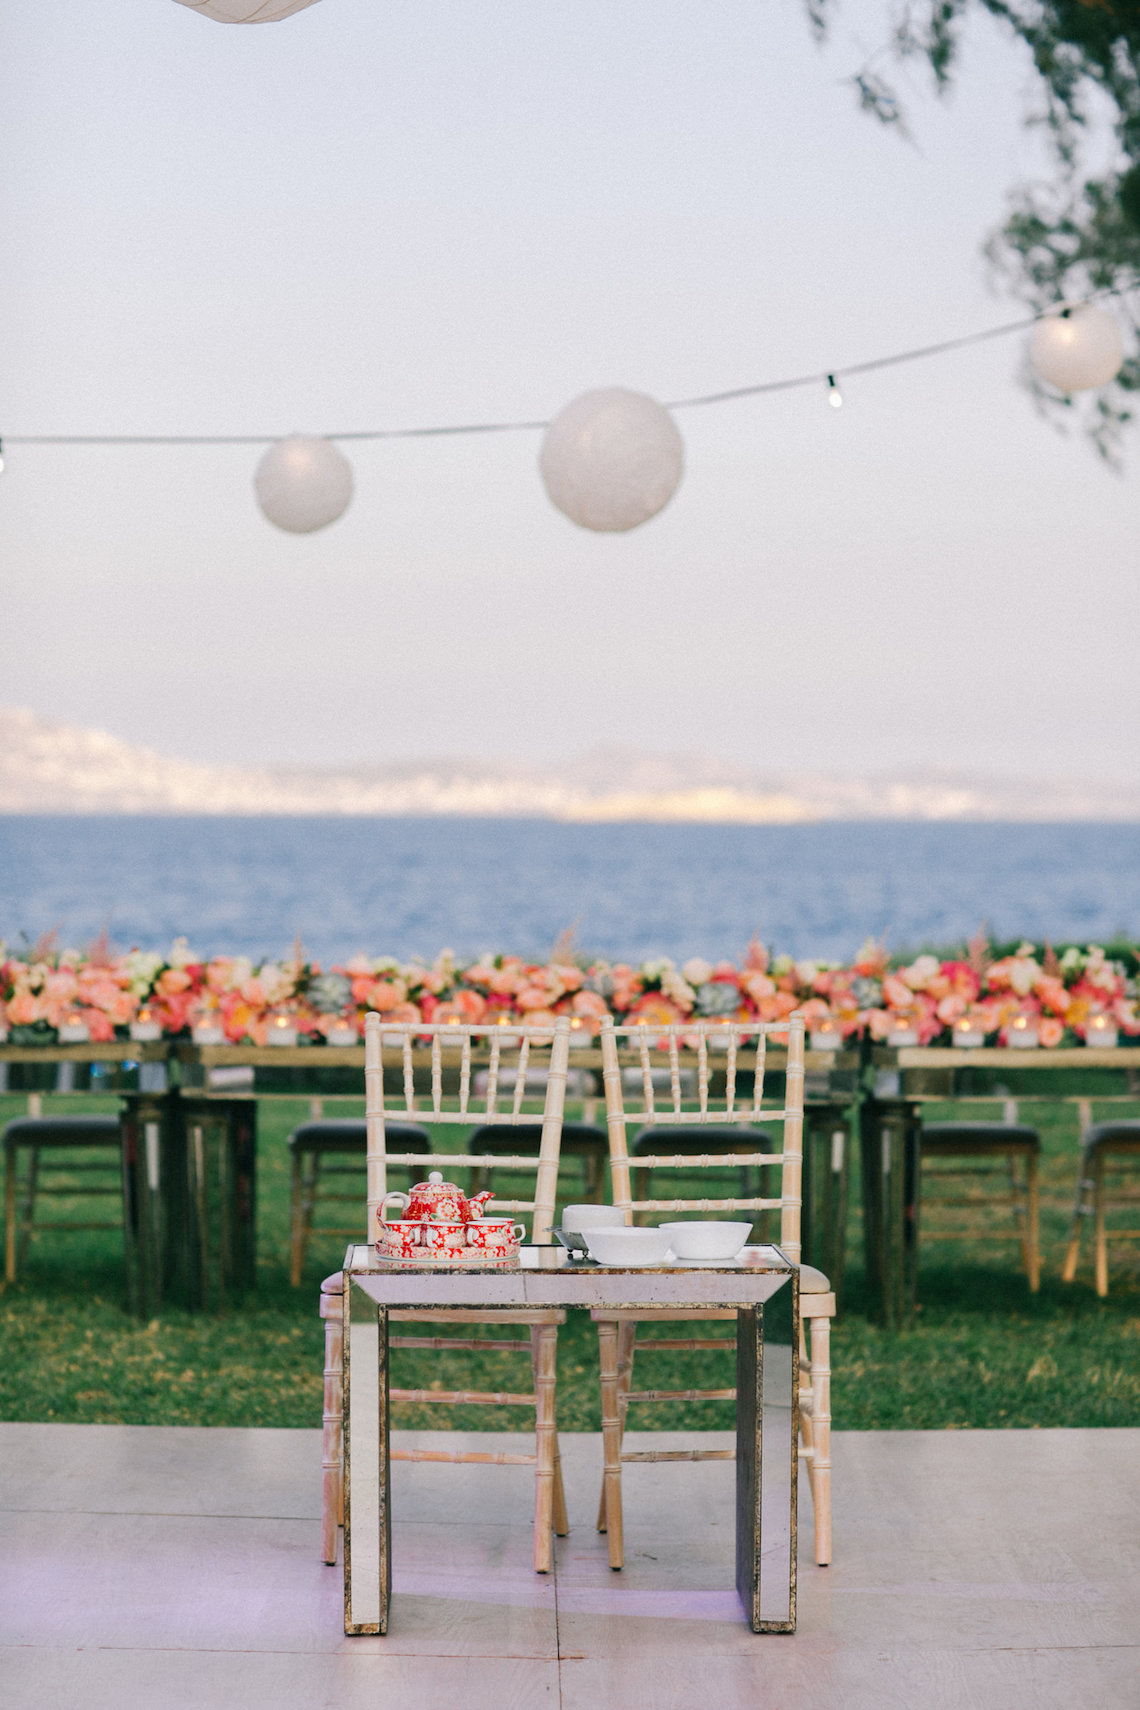 Multicultural Destination Wedding In Greece | Sotiris Tsakanikas 41